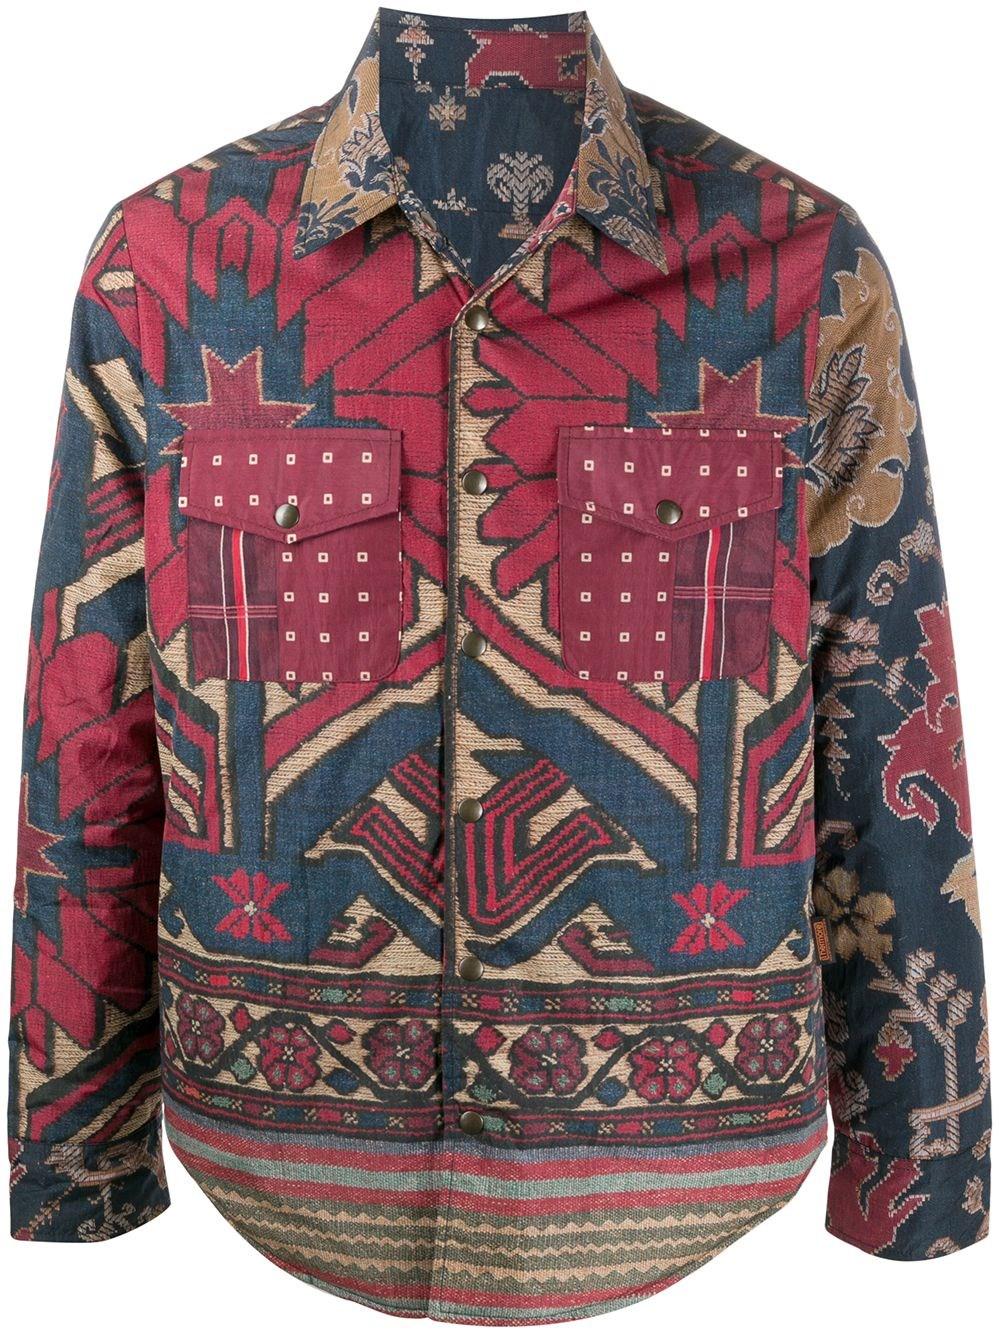 PIERRE LOUIS MASCIA Long Sleeve Shirt Jacket